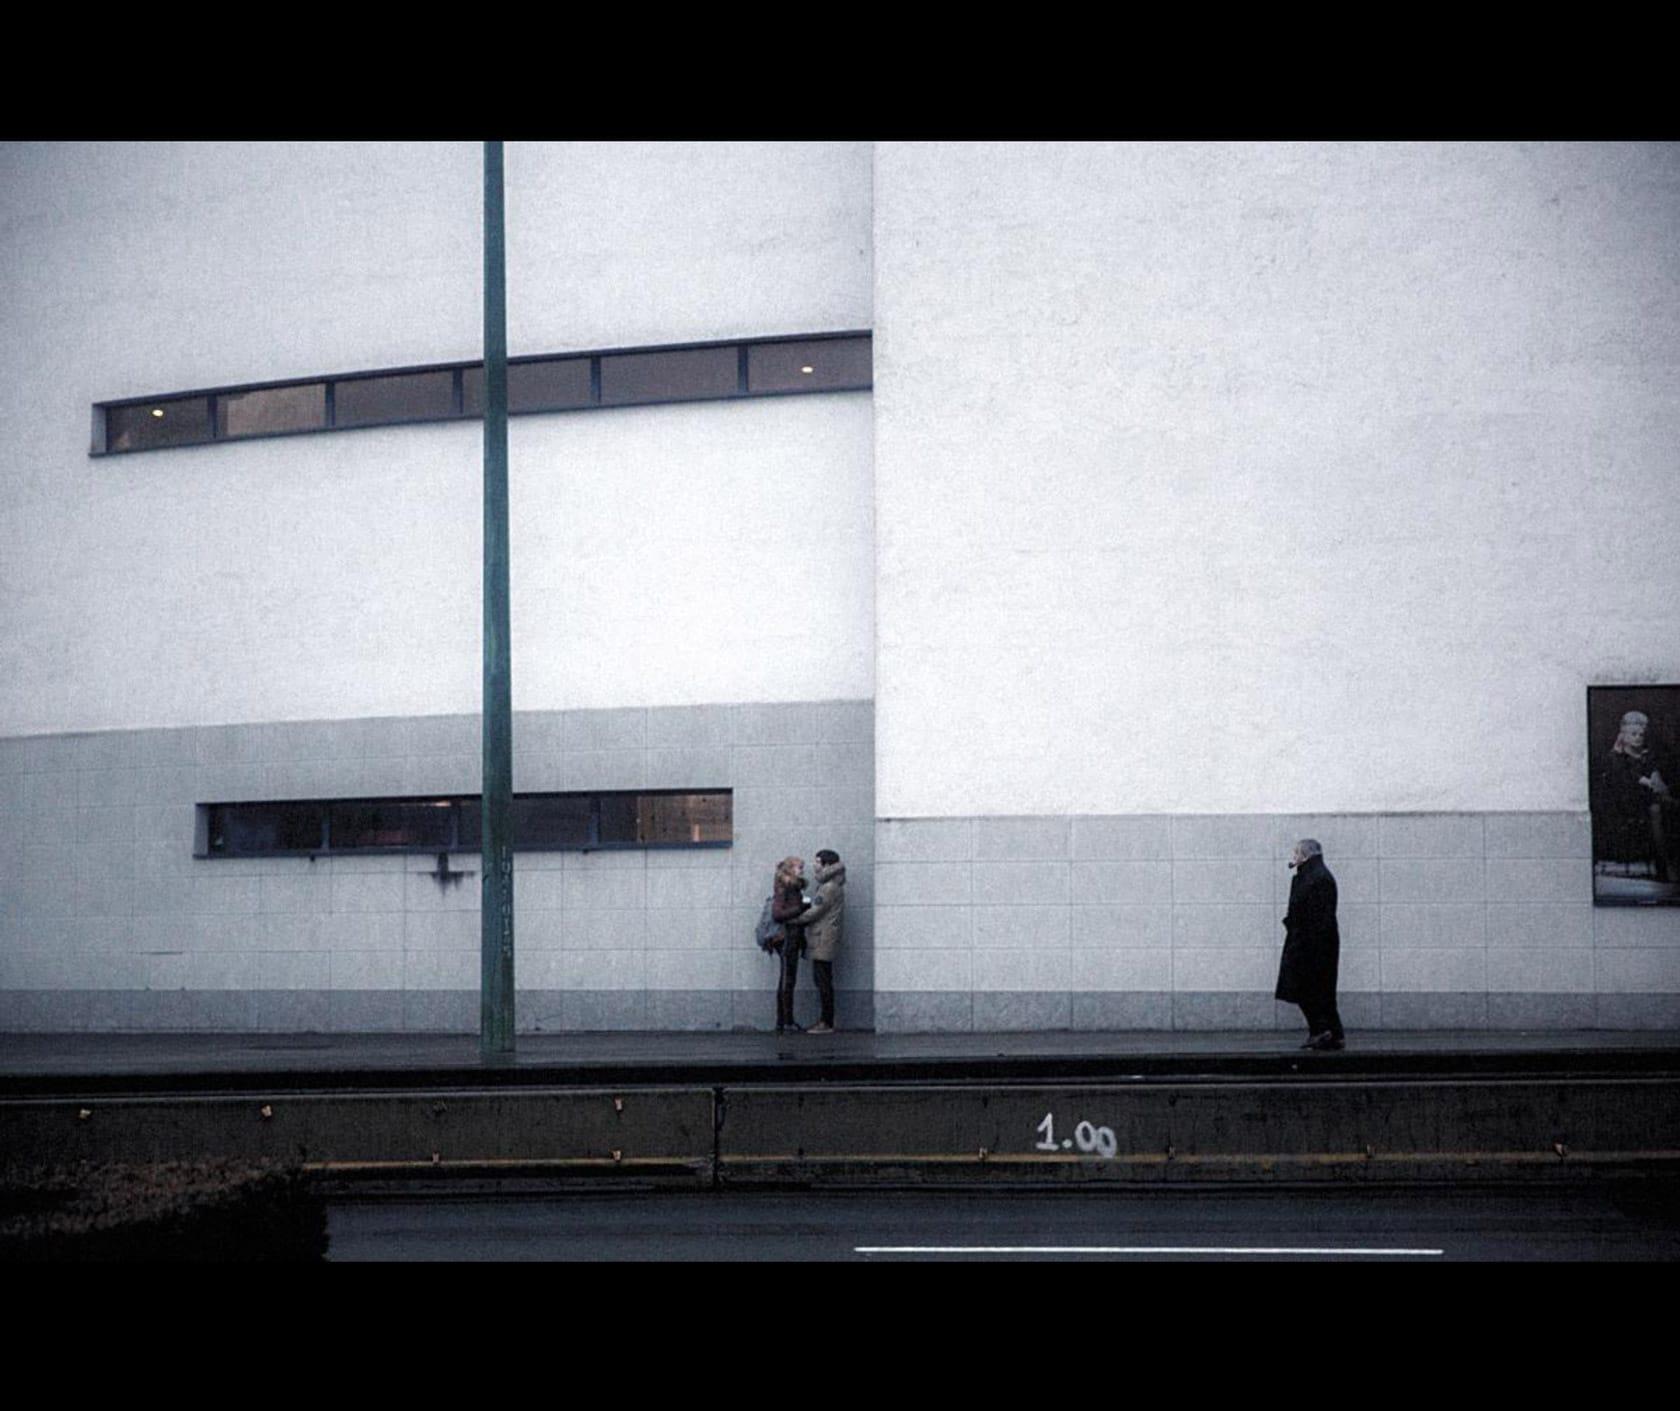 Streethunters Bookshelf: Michail Moscholios' Anti-Manual On Street Photography